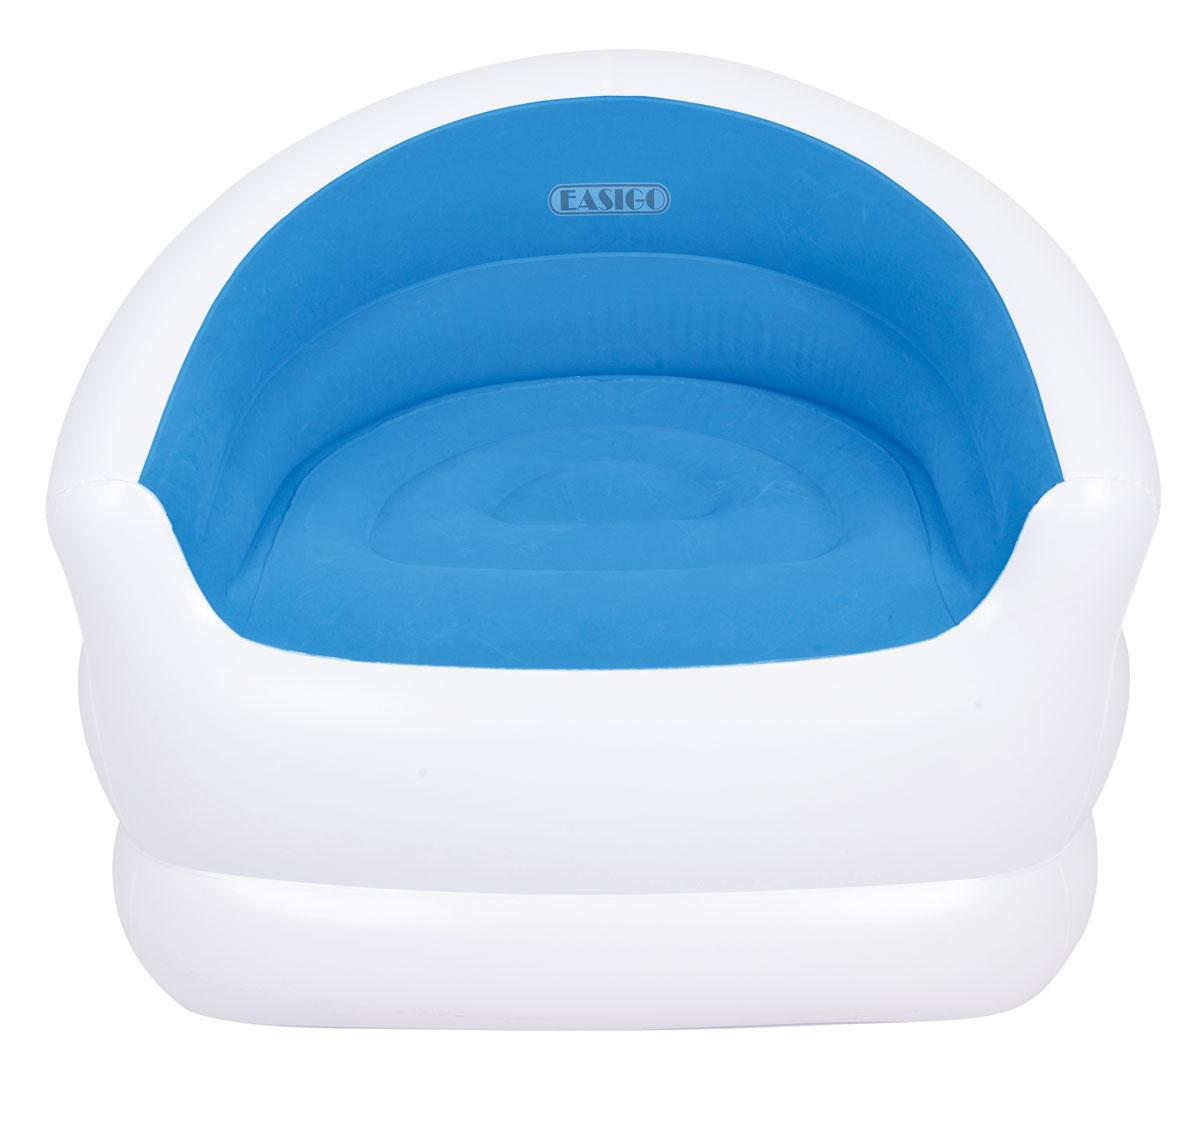 Кресло надувное RELAX COLOUR SPLASH, 94 см х 83 см х 76 см, цвет: синий, белый надувное кресло jilong relax colour splash blue white jl037257n